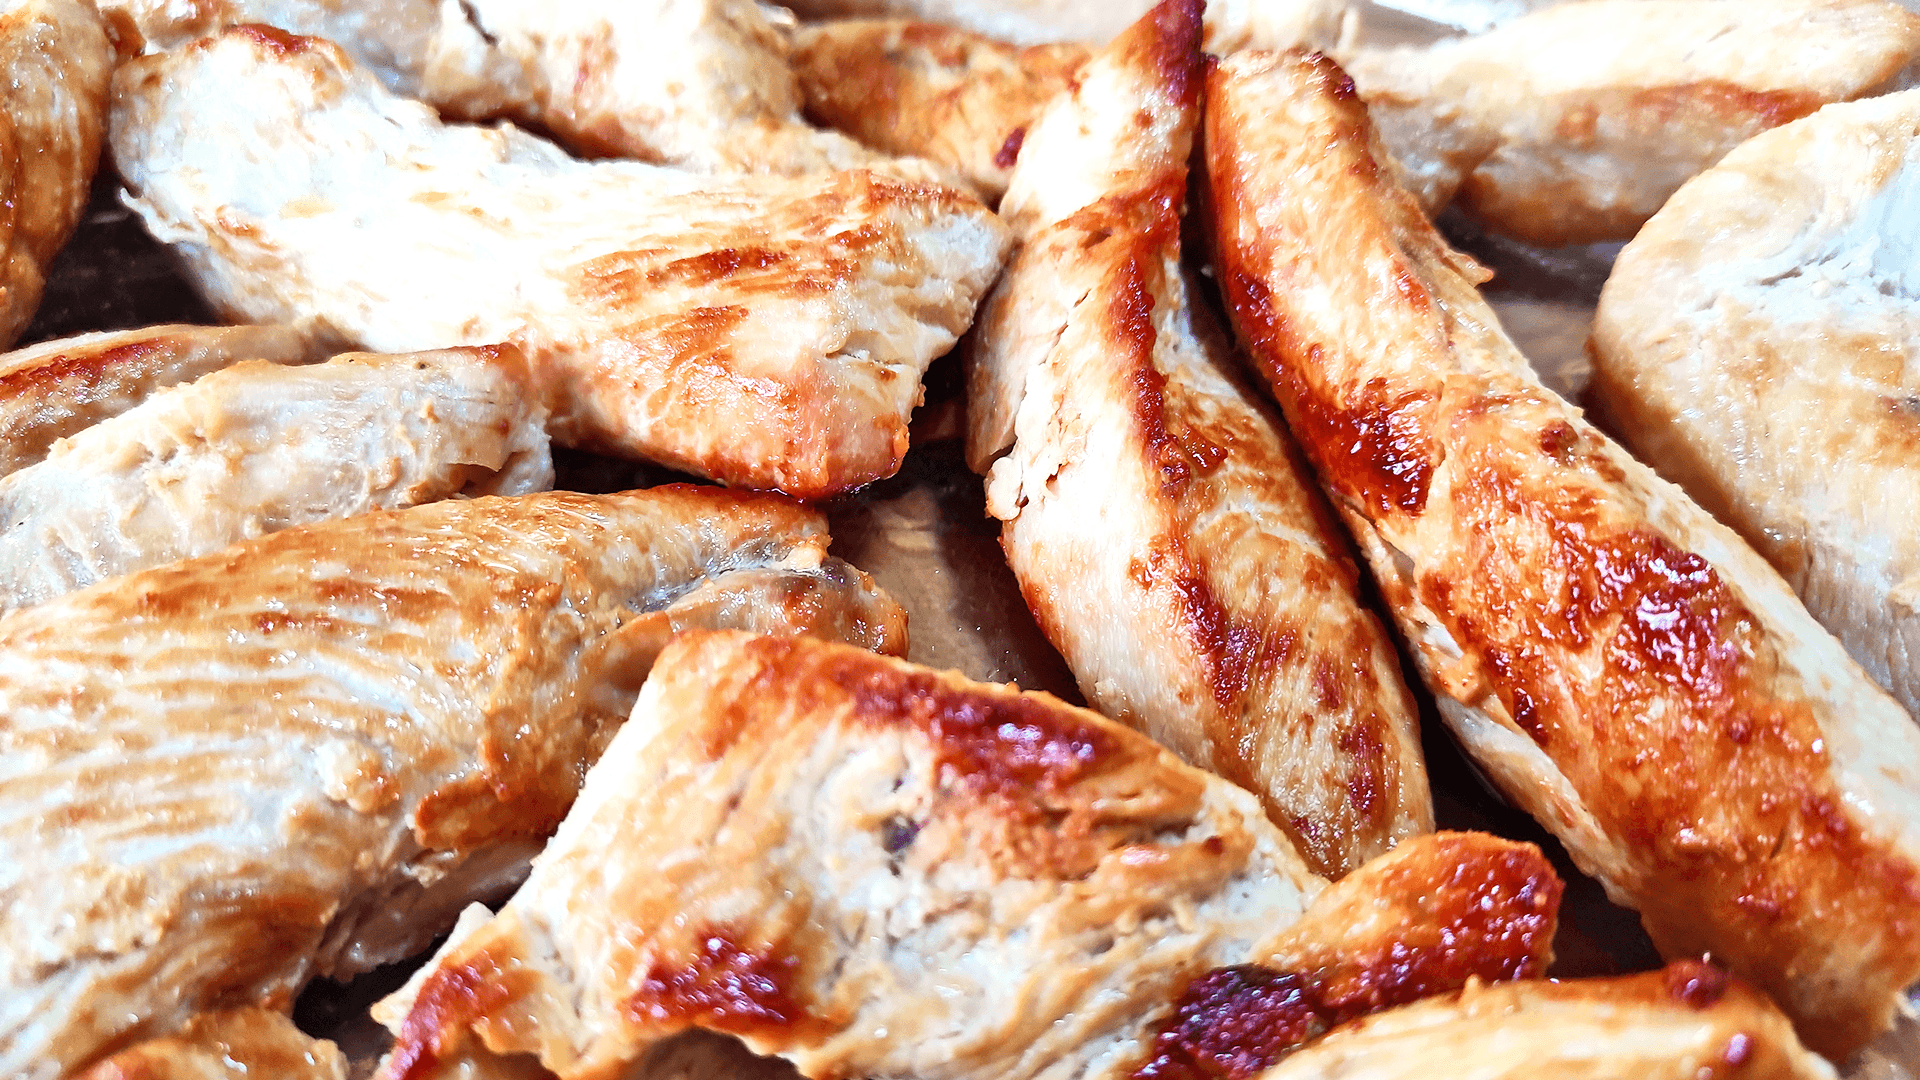 Fried Turkey Breast Recipe (Cooking Turkey Breast in the Pan)